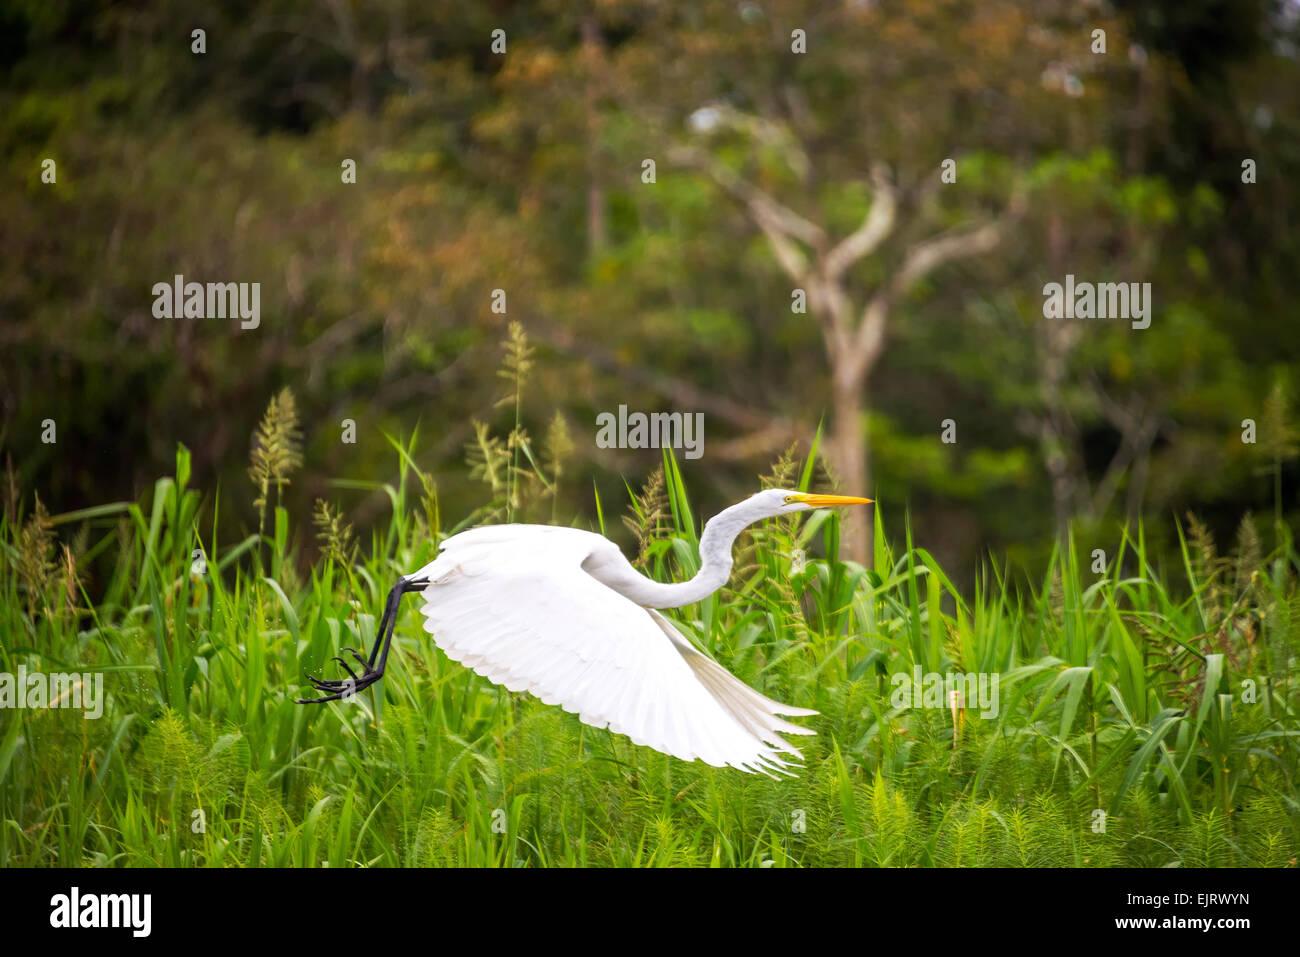 heron taking off Stock Photos & heron taking off Stock Images - Alamy